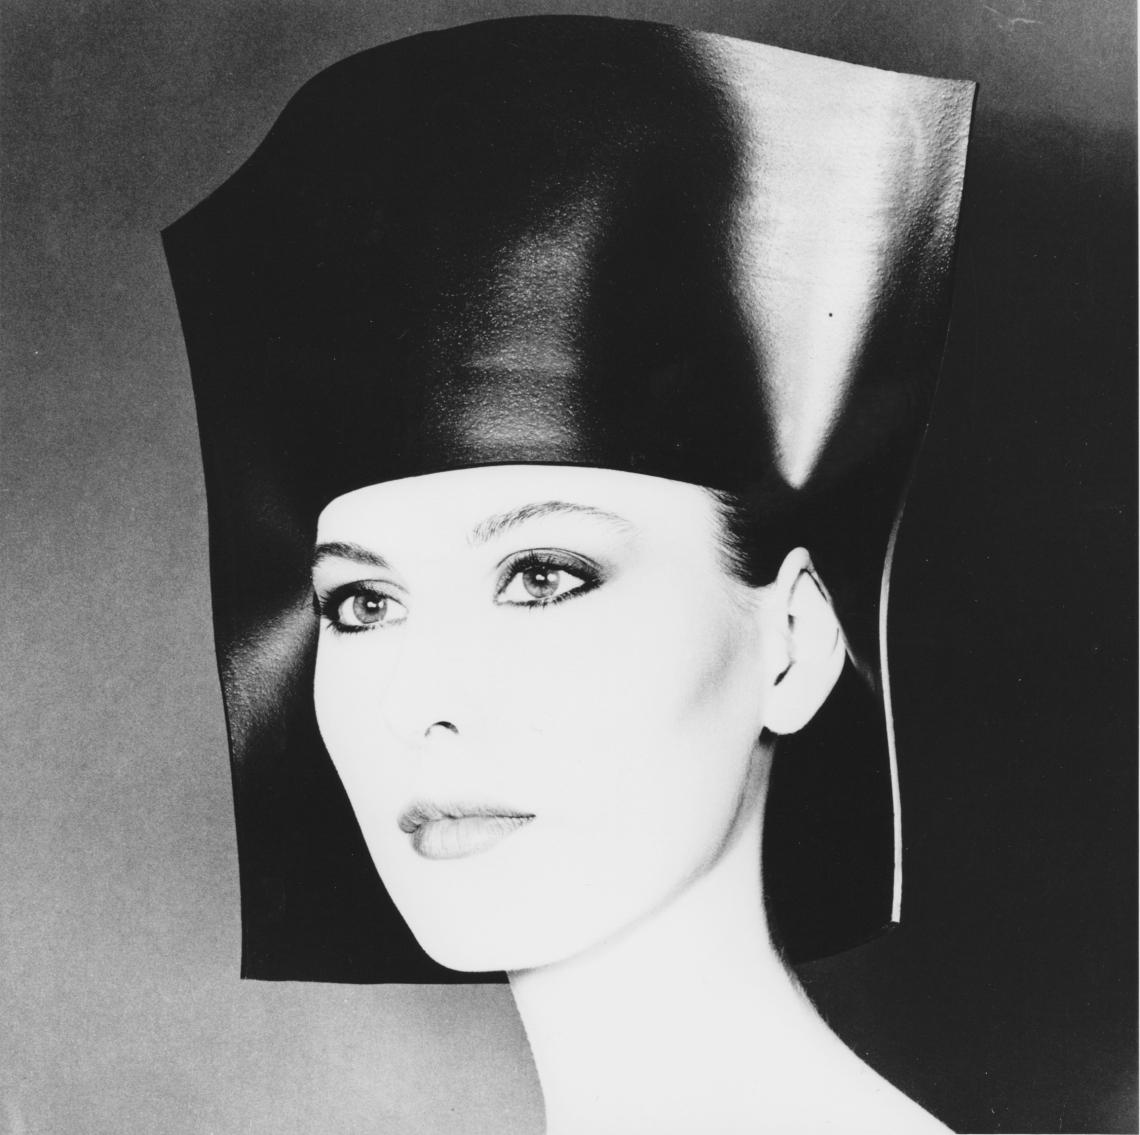 Maria Blaisse, Flexicap 4, 1985-1989. Foto met dank aan Maria Blaisse©